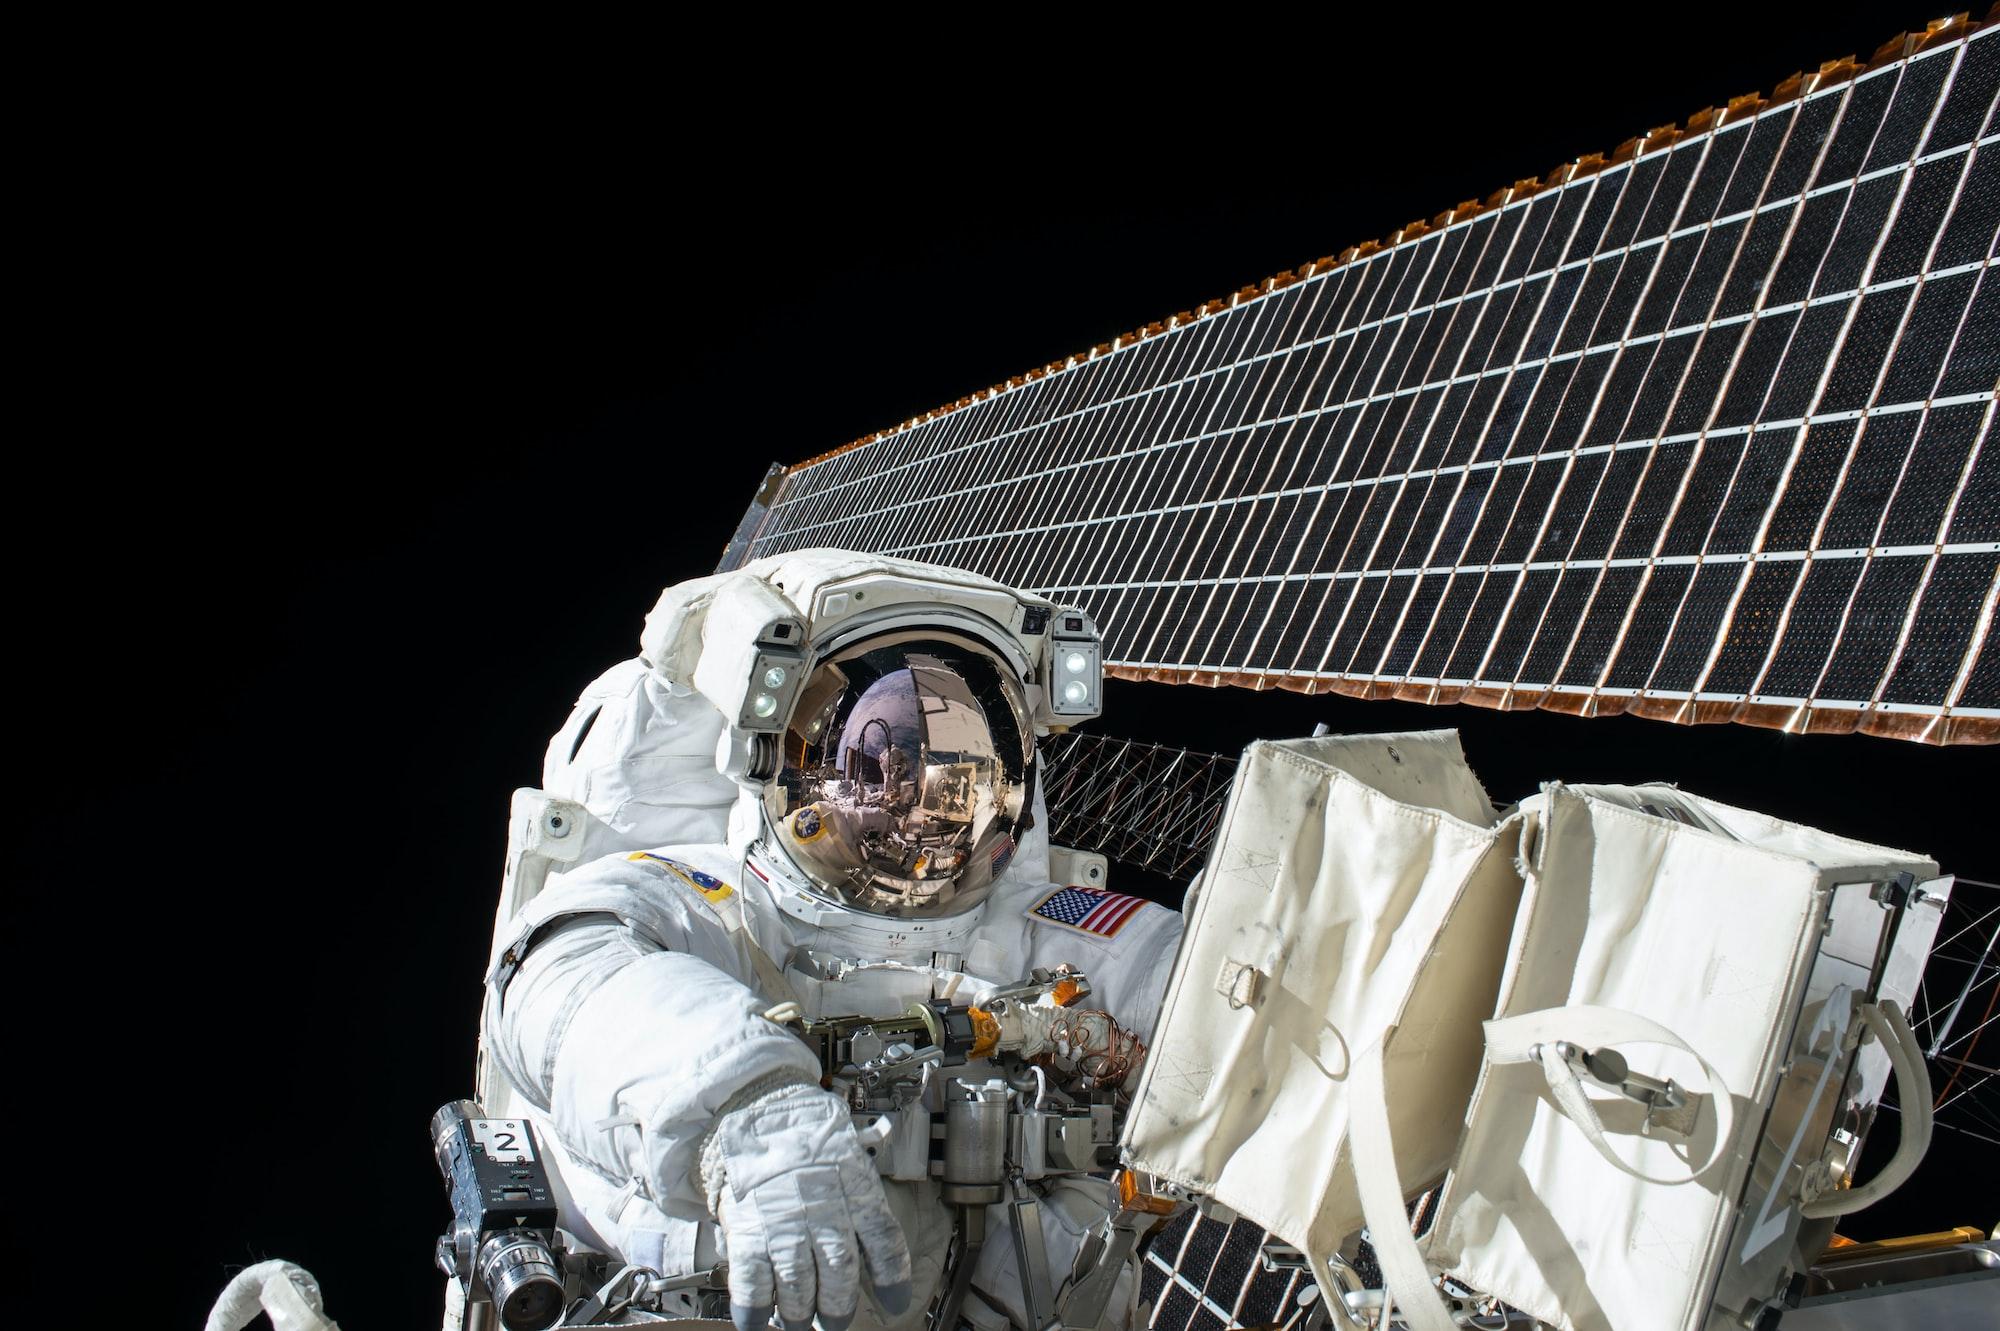 NASA ลุยสร้าง Blockchain Solution สำหรับการสื่อสารทางอวกาศ